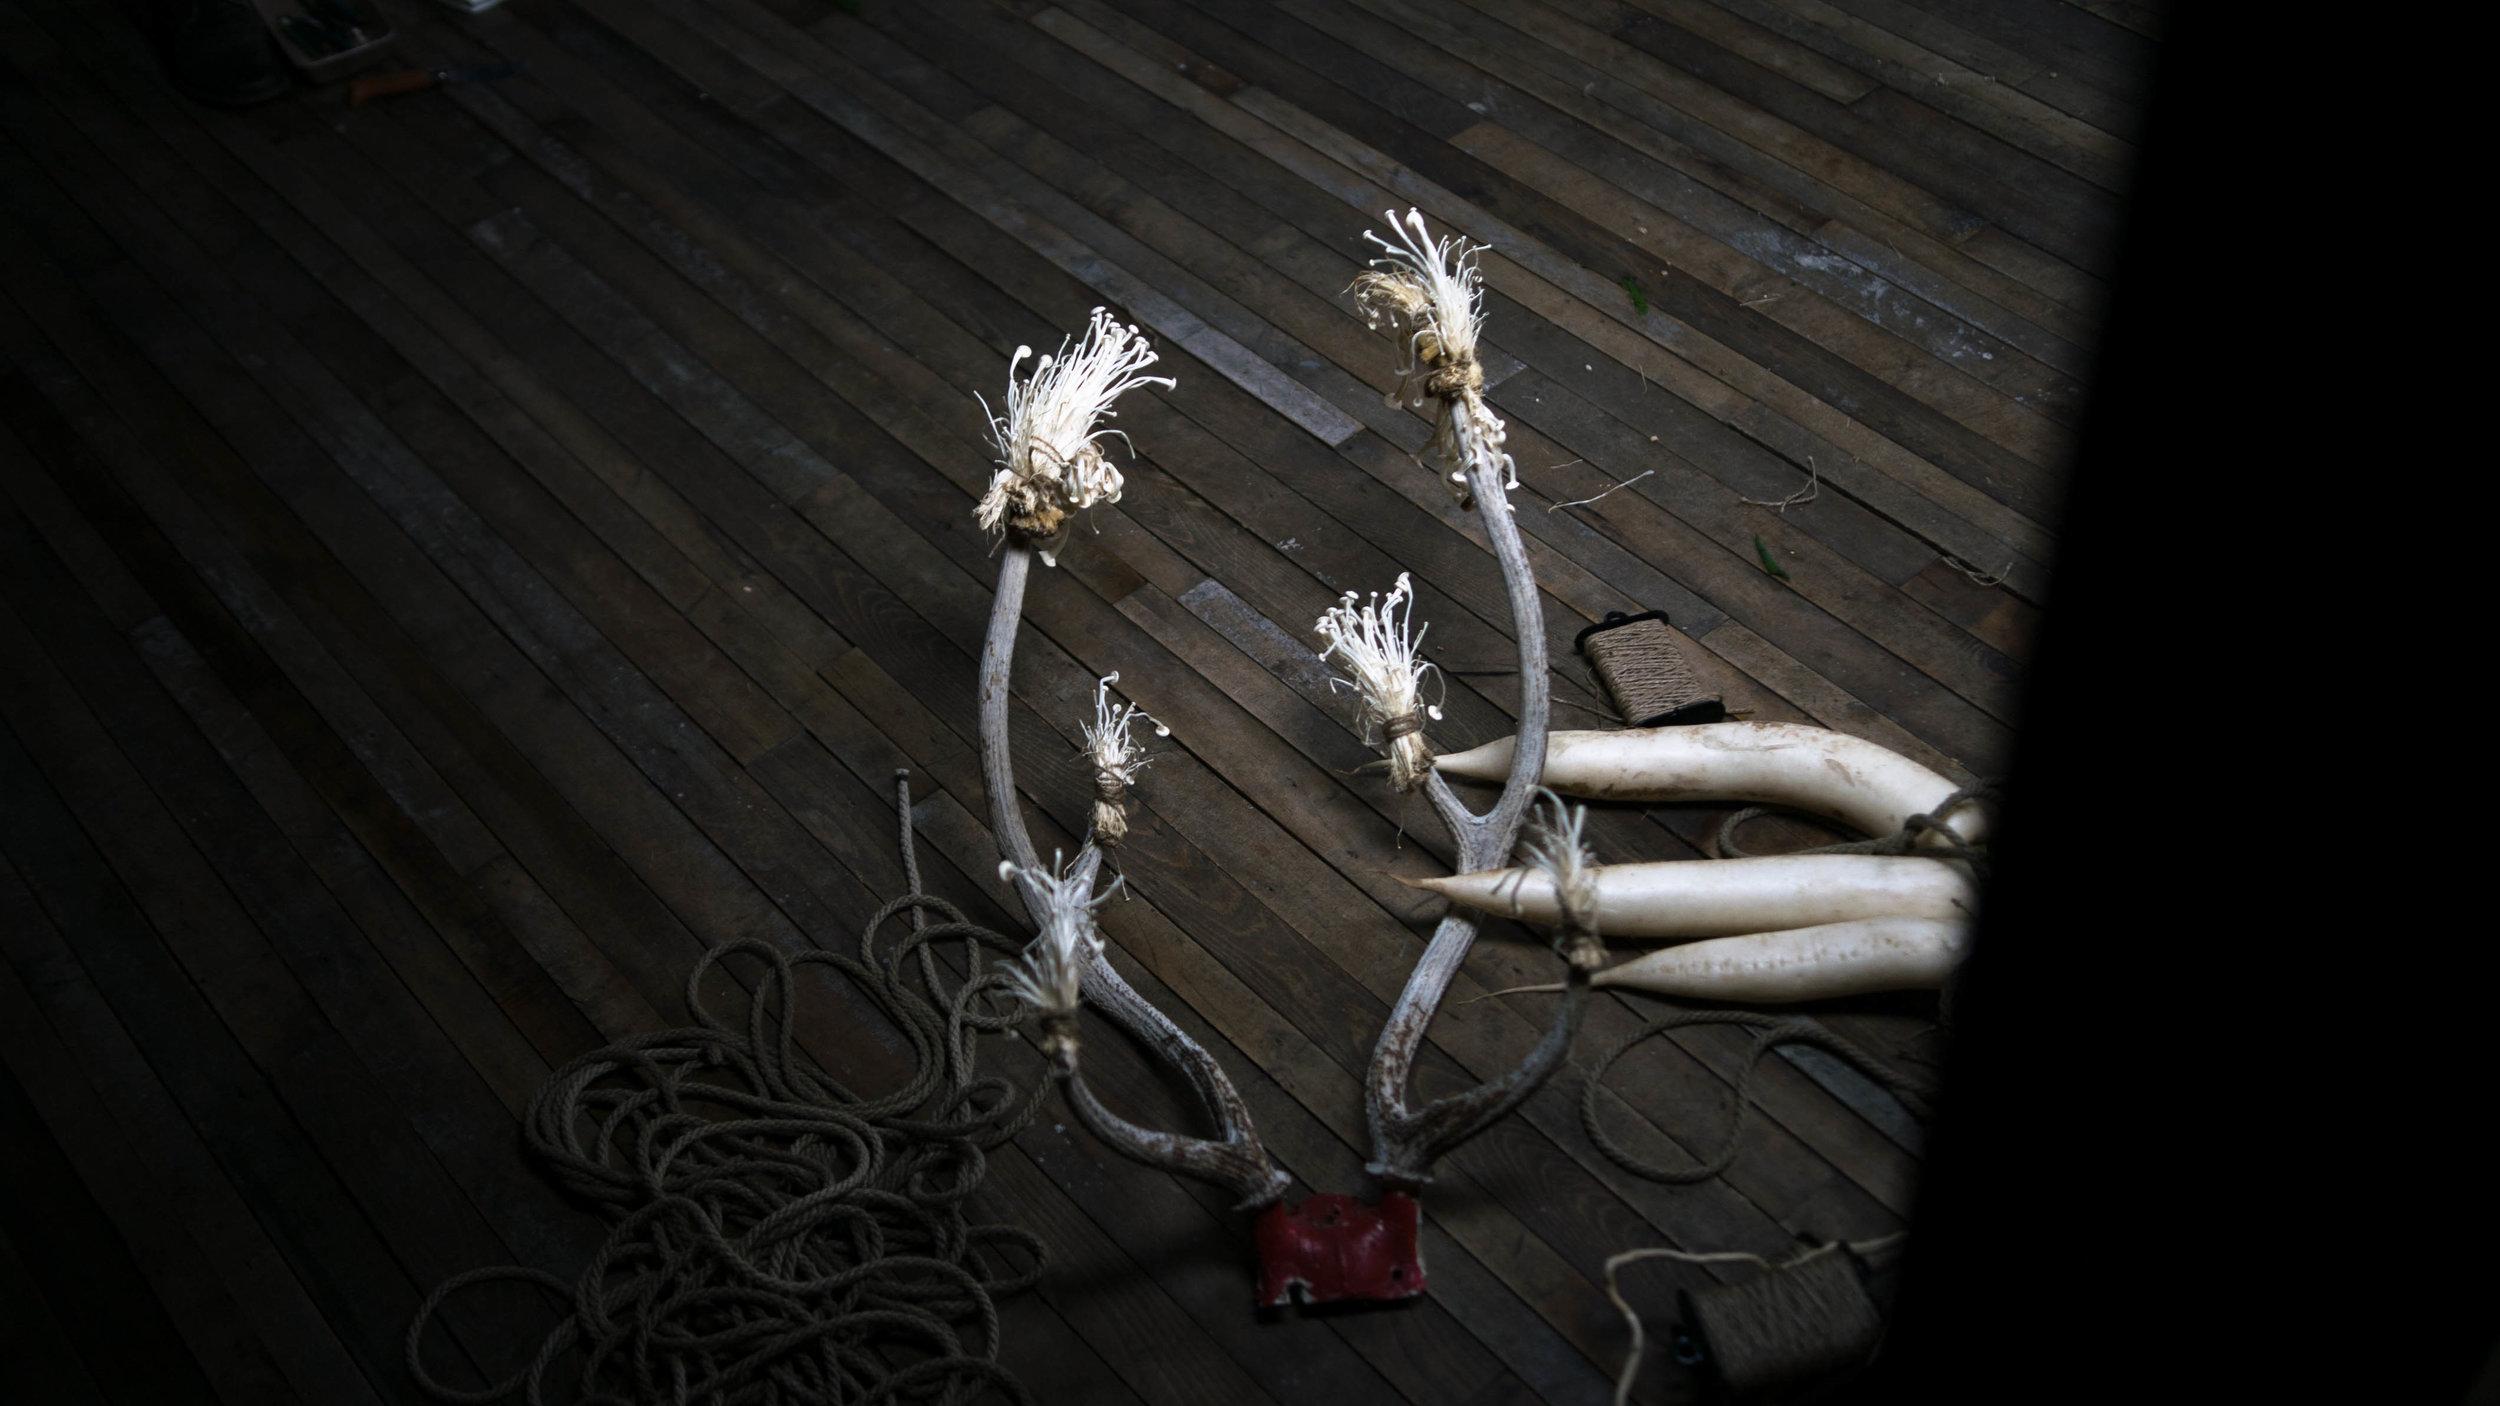 oliver franklin anderson, reindeer, caribou, antlers, rack, red, mushrooms, bondage, tied, decorative, shroom, fungi, fashion film, bdsm, rope, twisted monk, figure drawing, life drawing, prop, nature, natural, design, radish, erotic, appleton, wisconsin, deer, bones